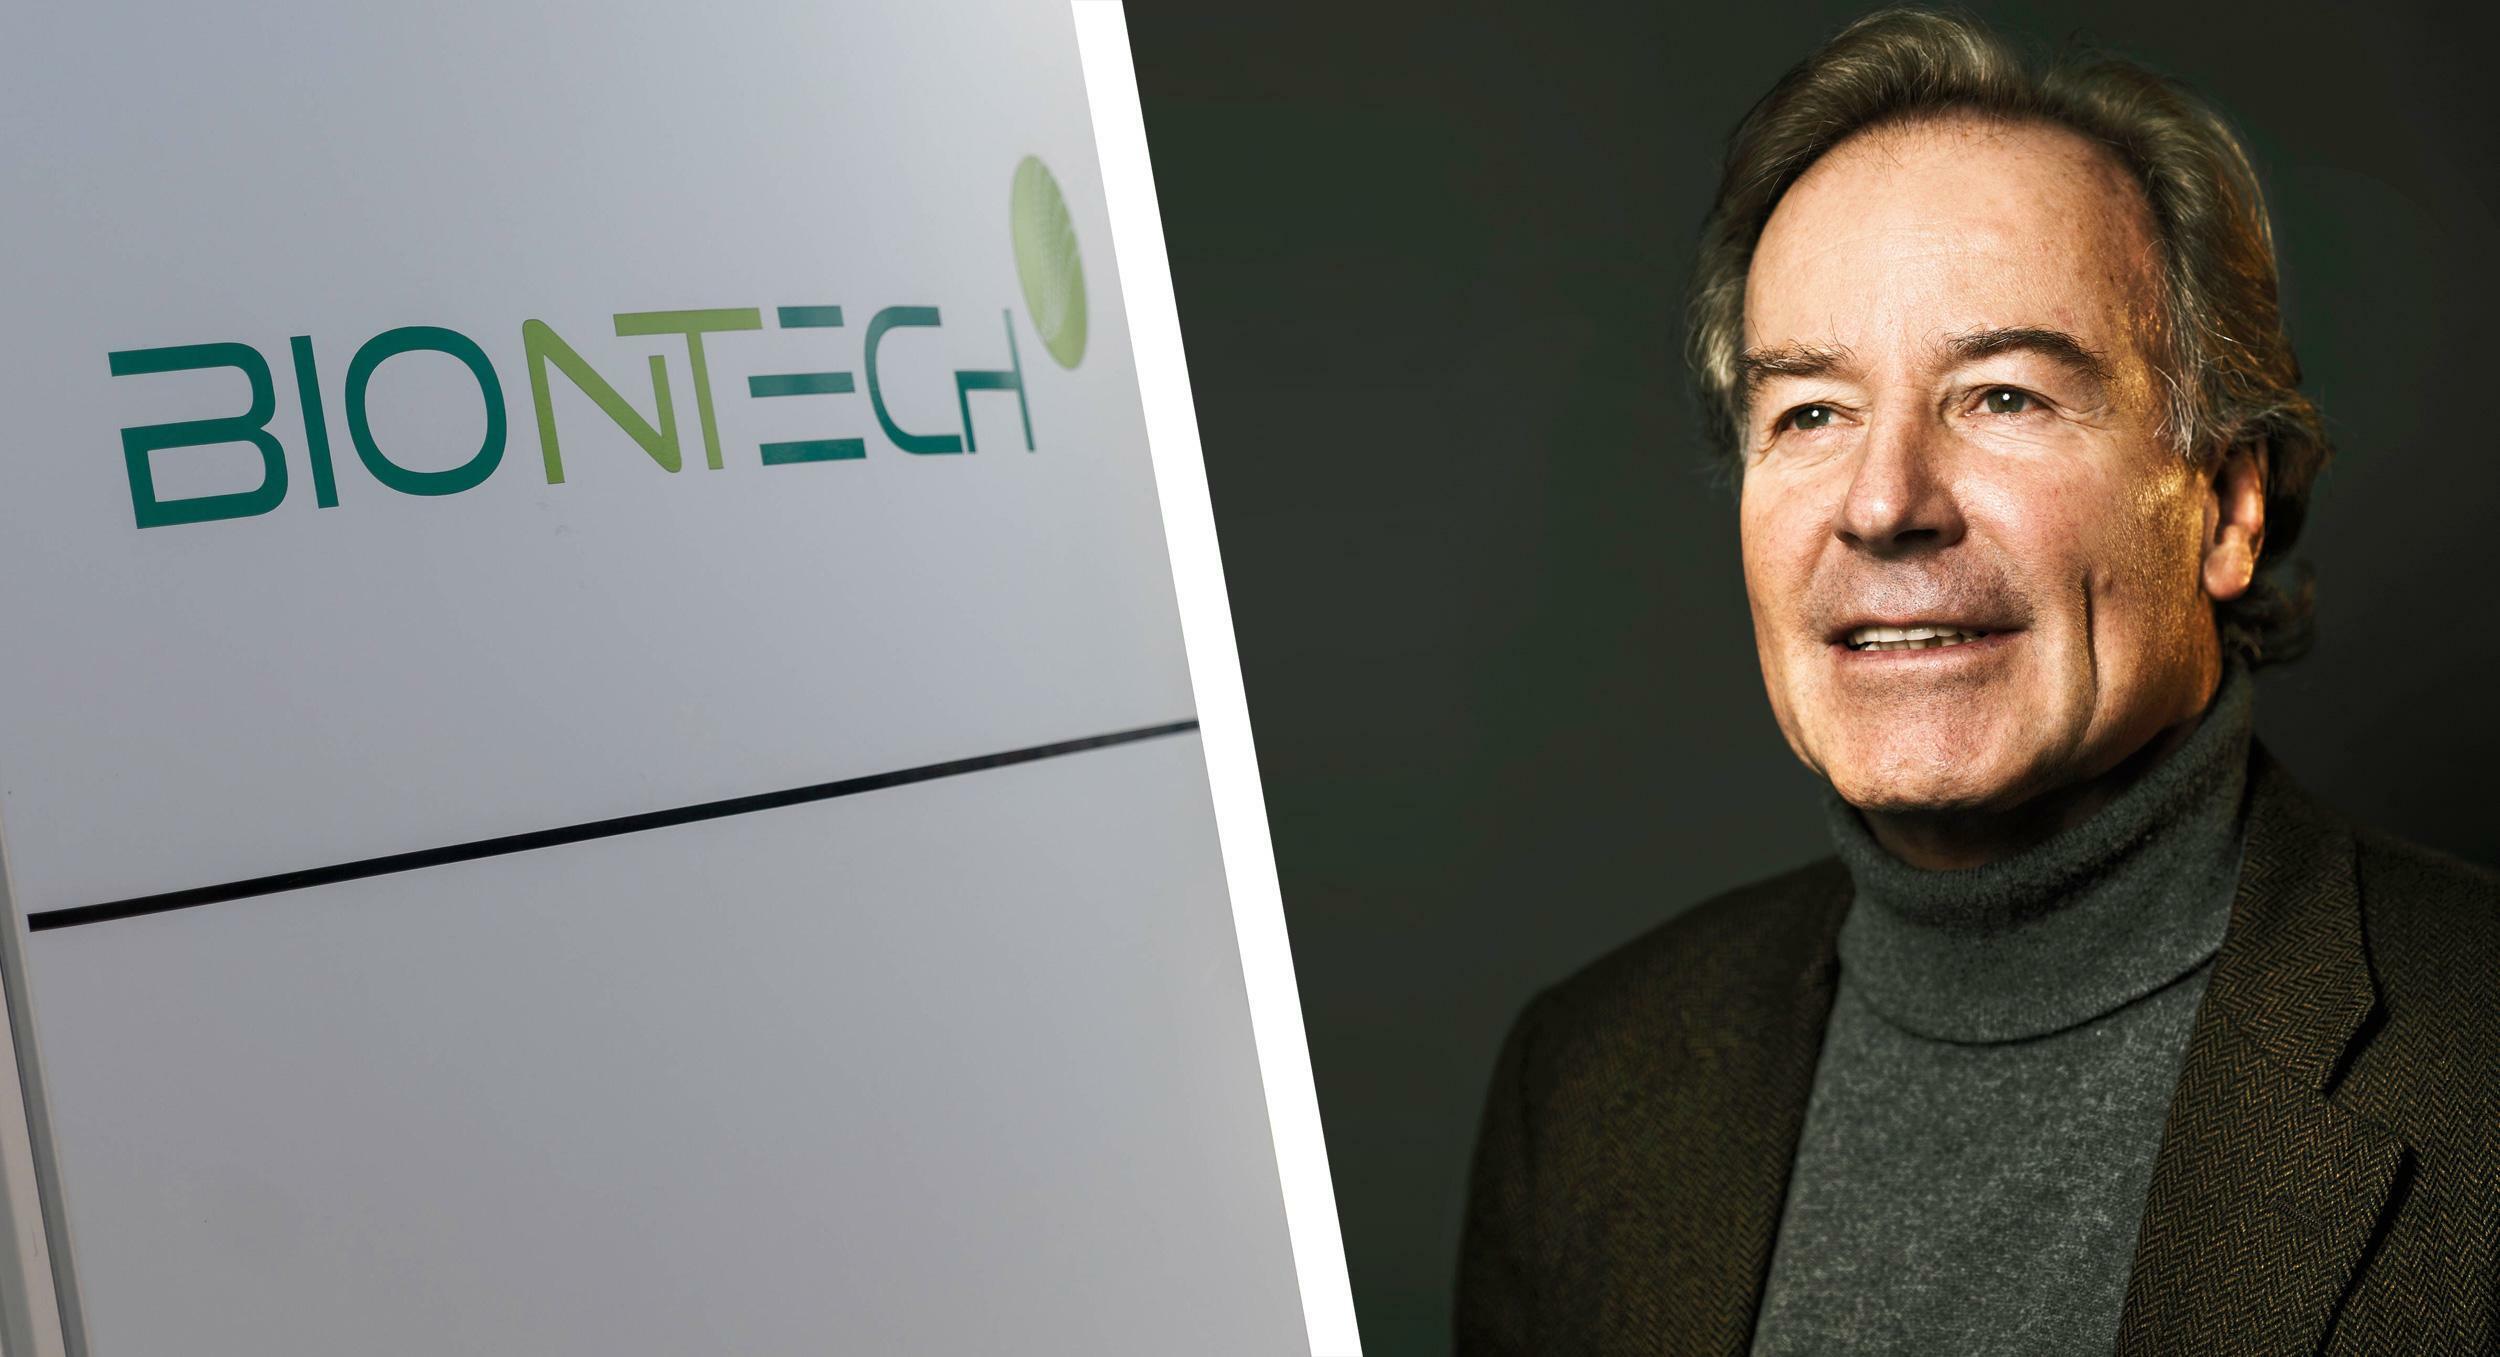 Biontech Investor Thomas Strungmann Der Pharma David